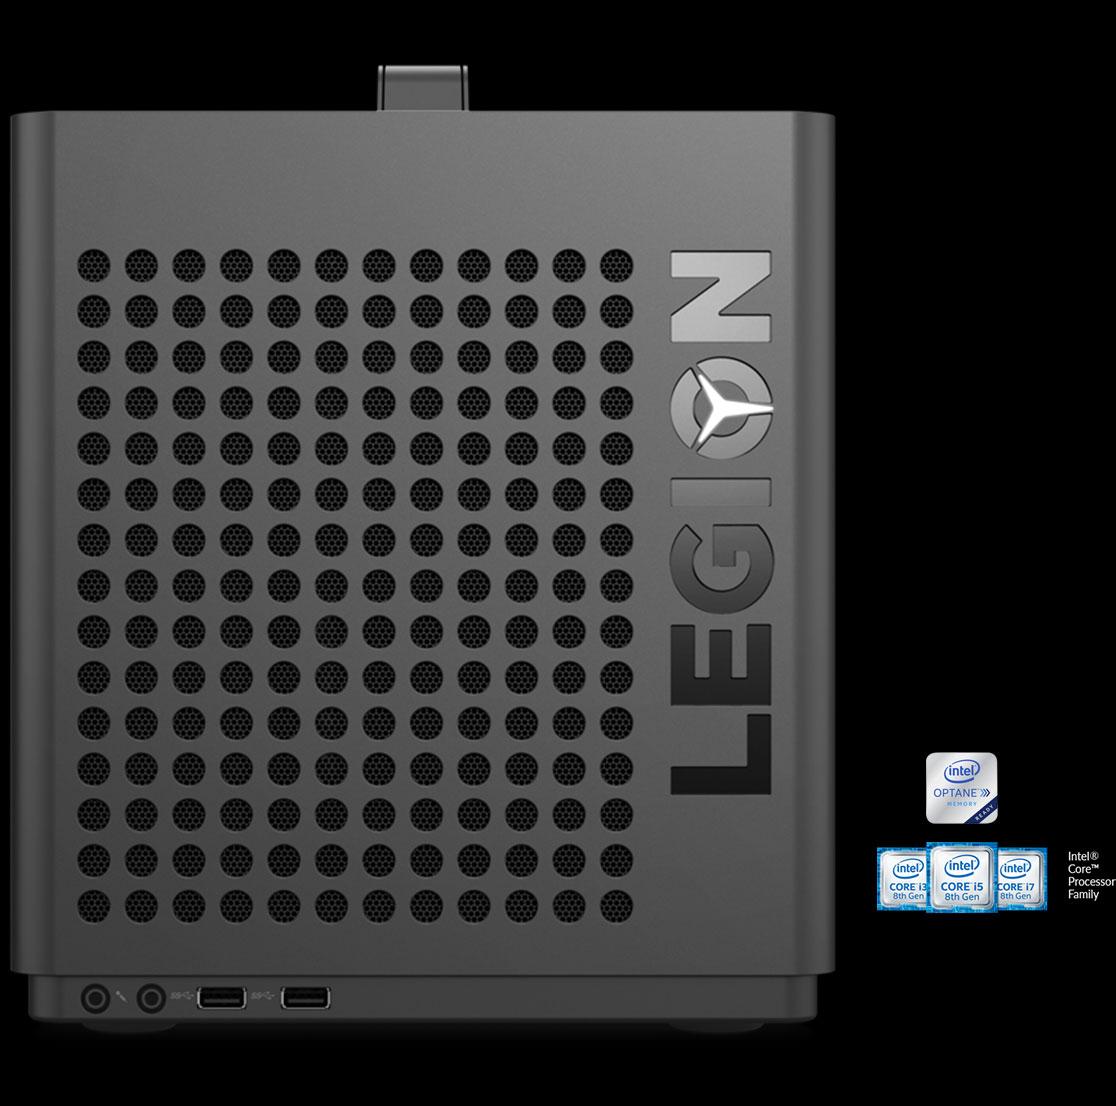 Lenovo Legion C530 ports.